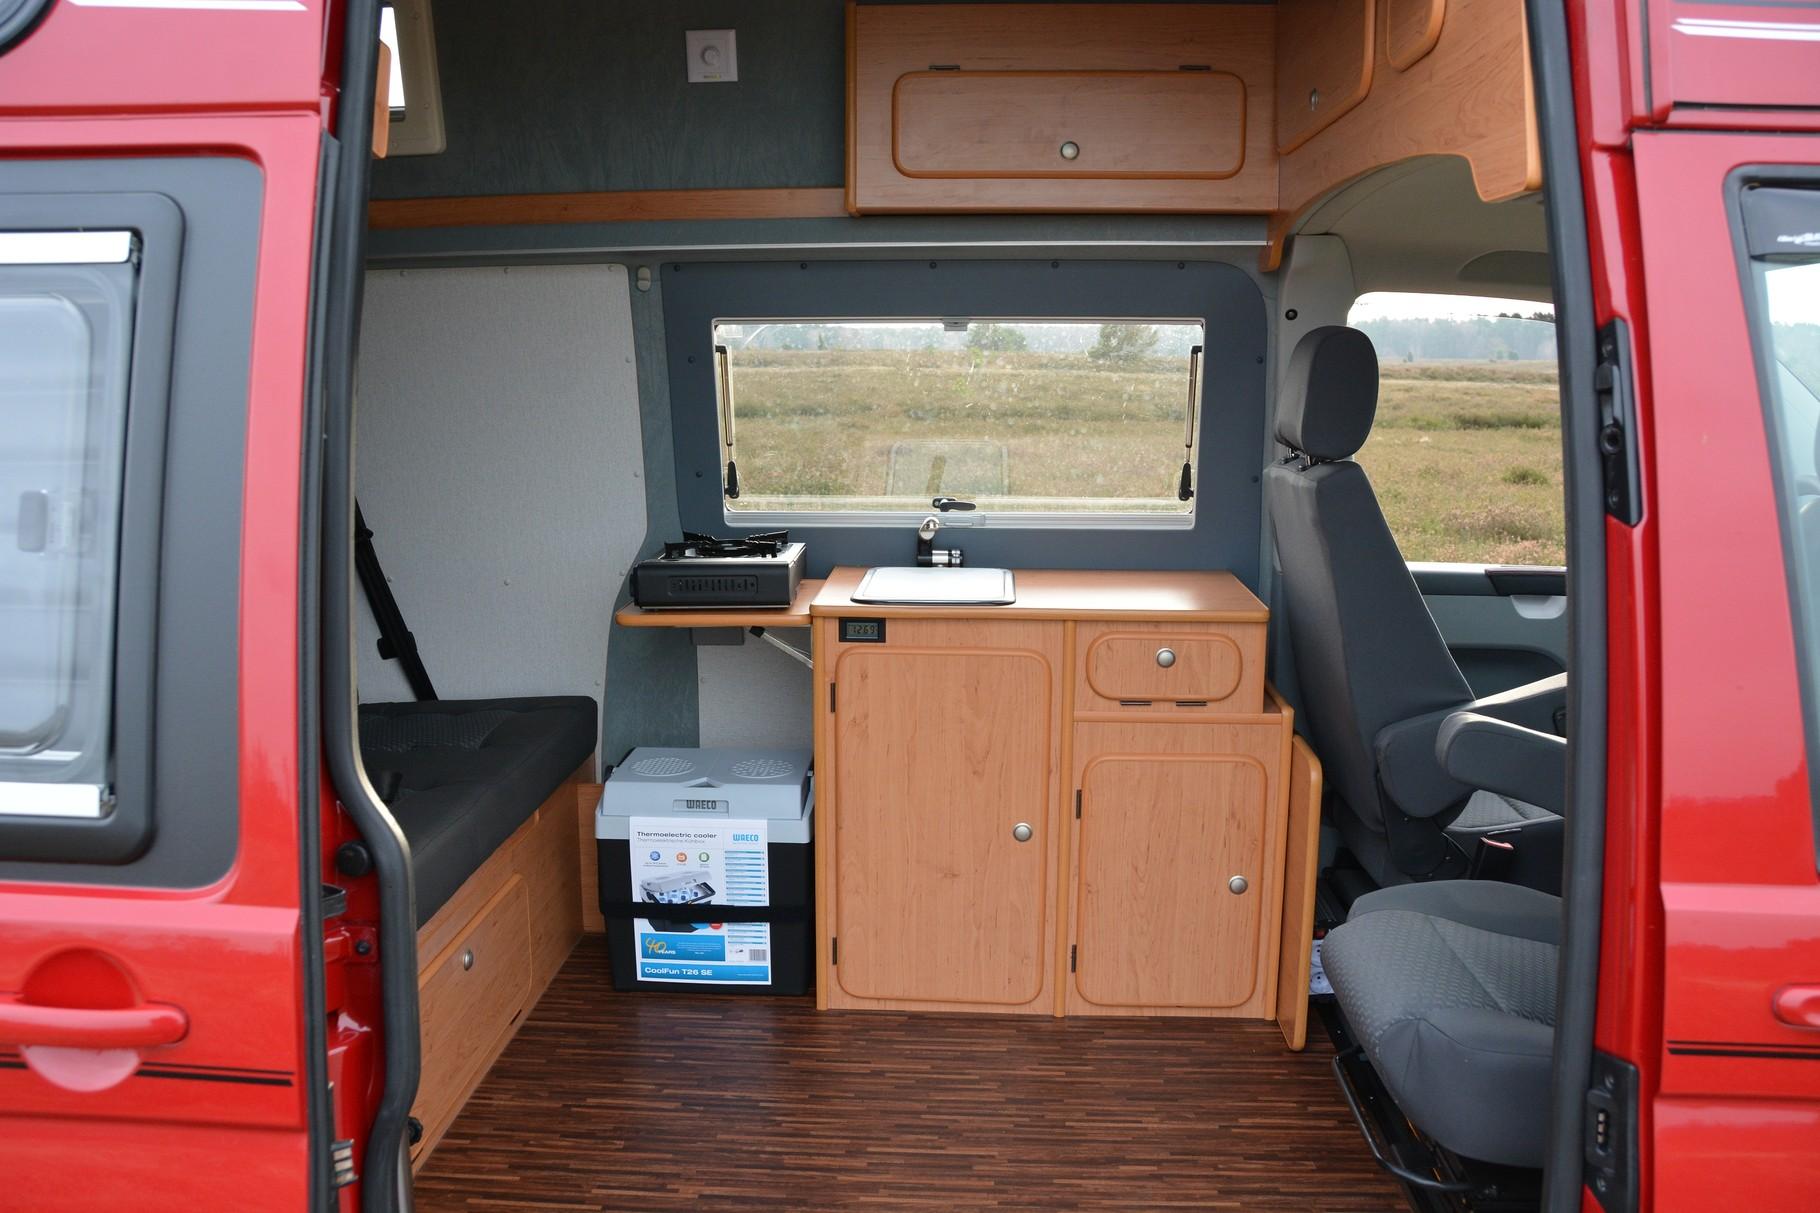 Spacecamper classic der vw t6 camping ausbau t4 k che for Kuchenblock wohnmobil gebraucht